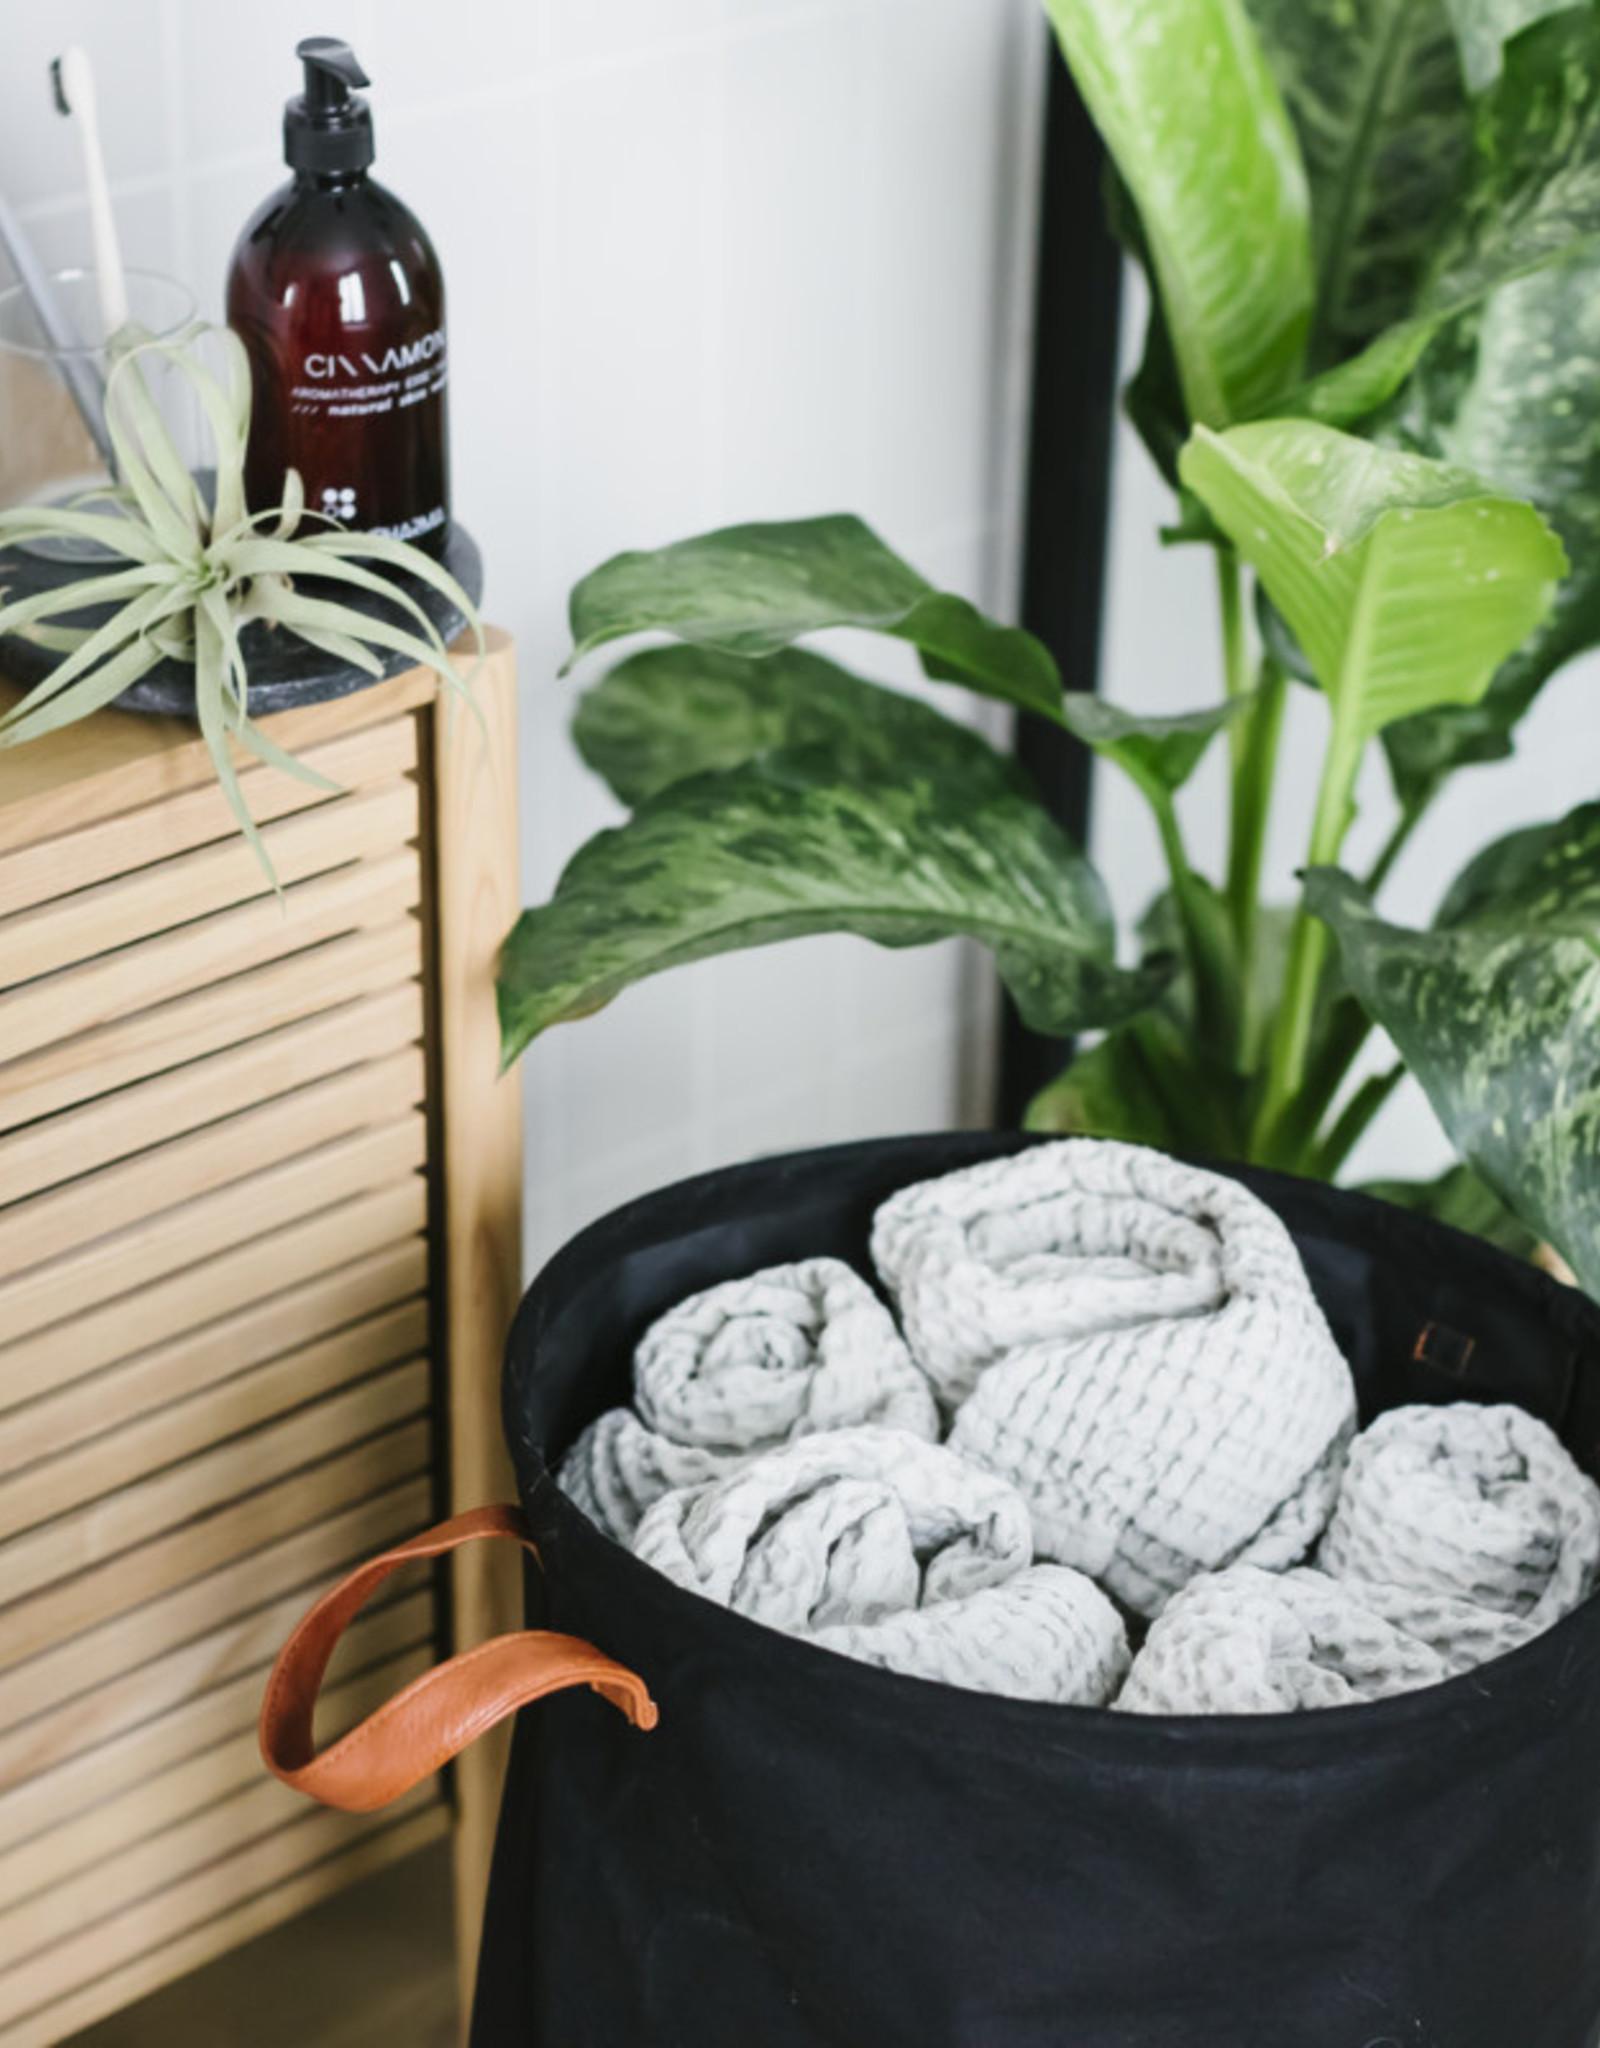 RainPharma Laundry Bag - Rainpharma